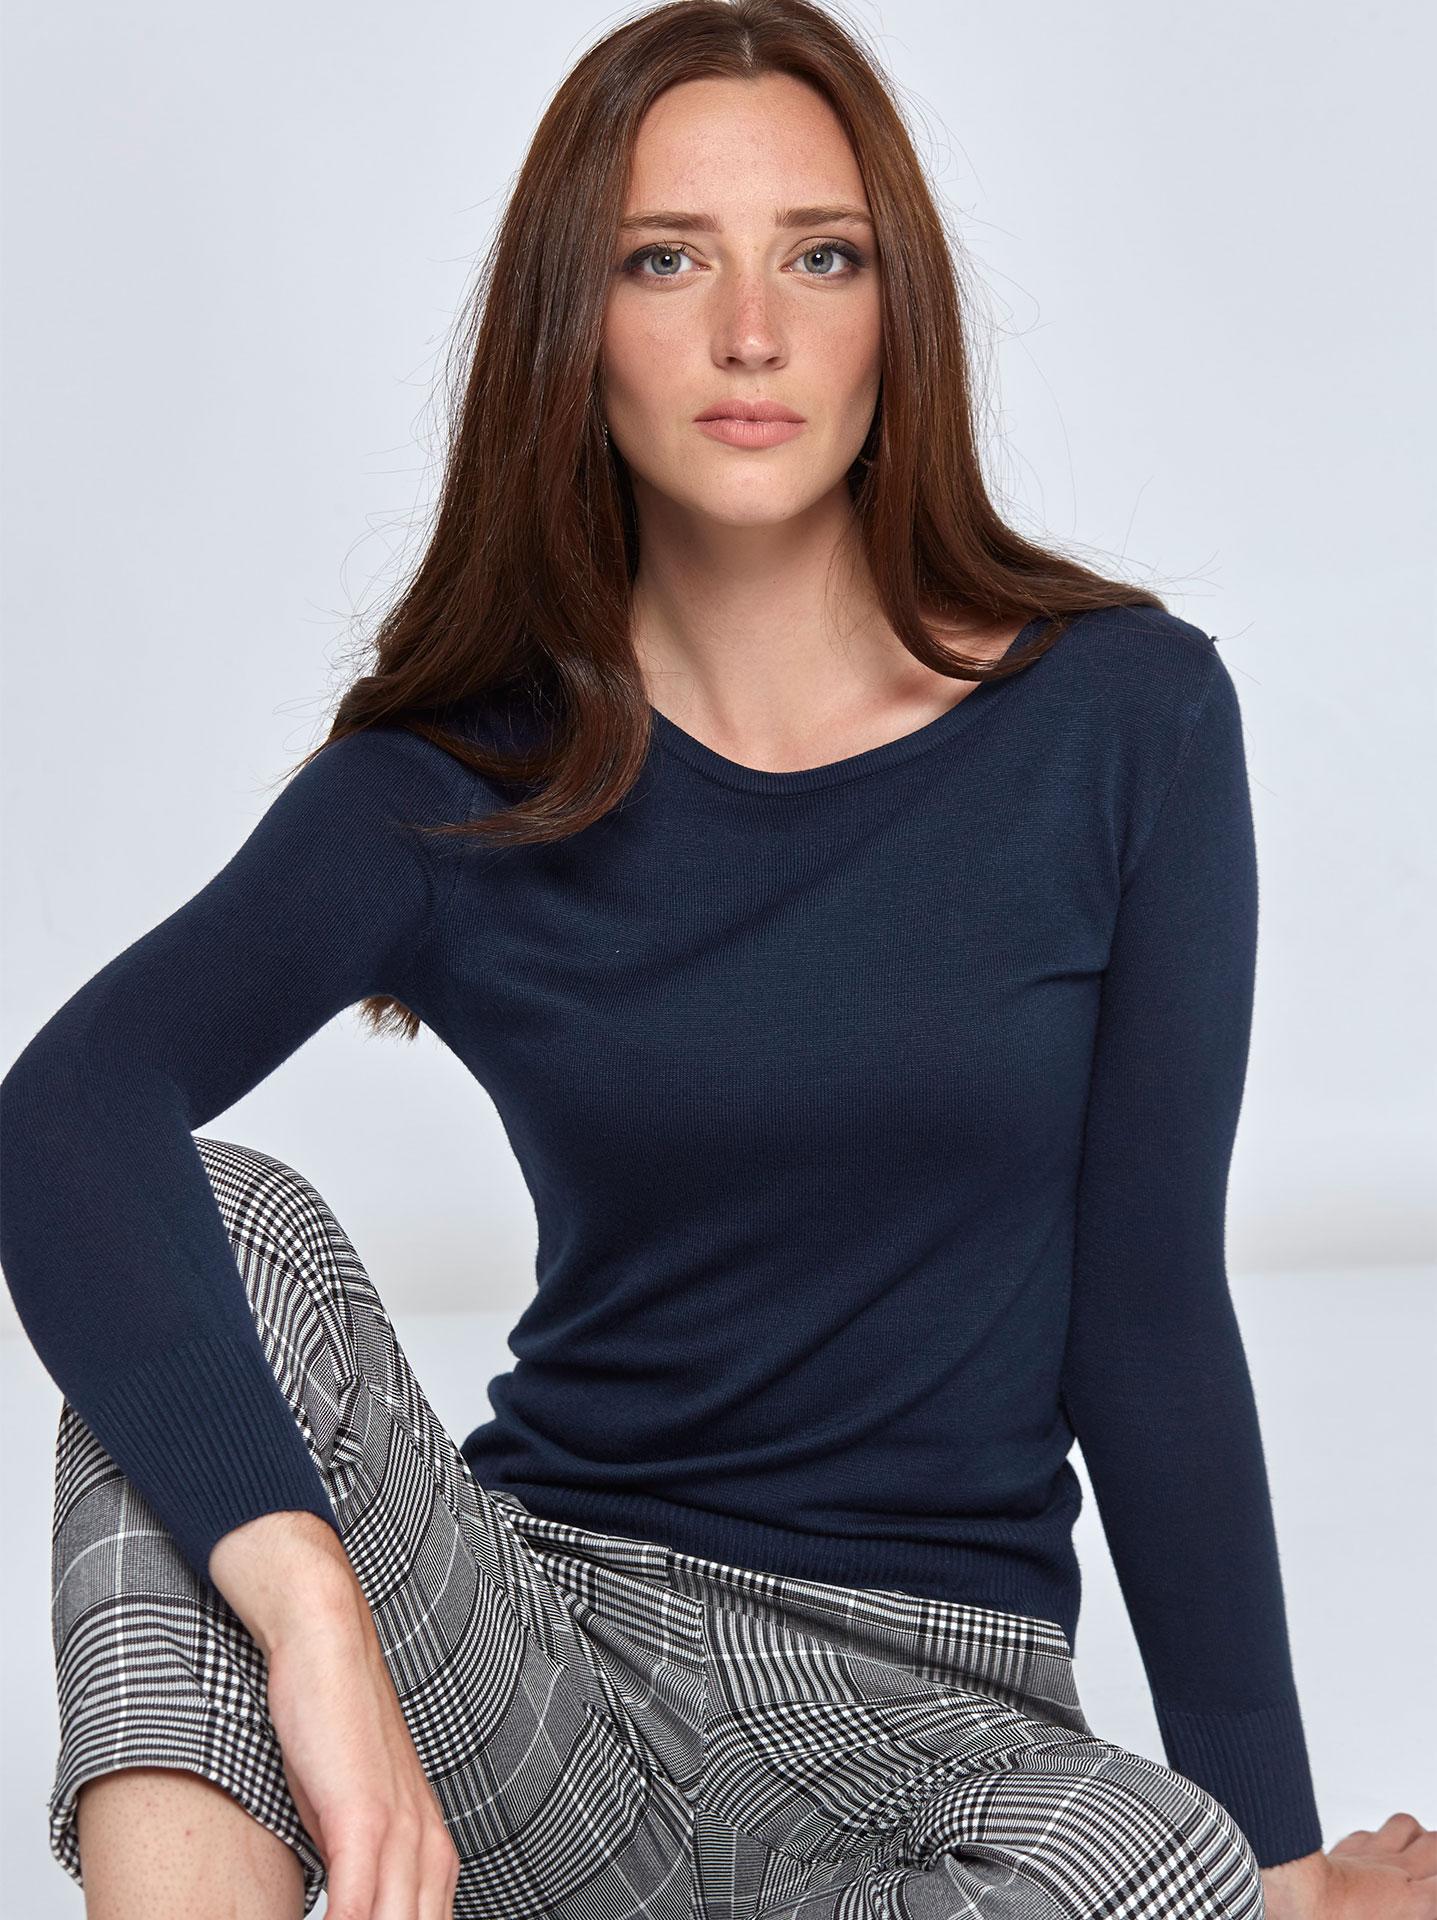 cc61b7709f6f Γυναικεία Ρούχα Πλεκτά-Ζακέτες Πουλόβερ σε λεπτή πλέξη WL1369.9022+6